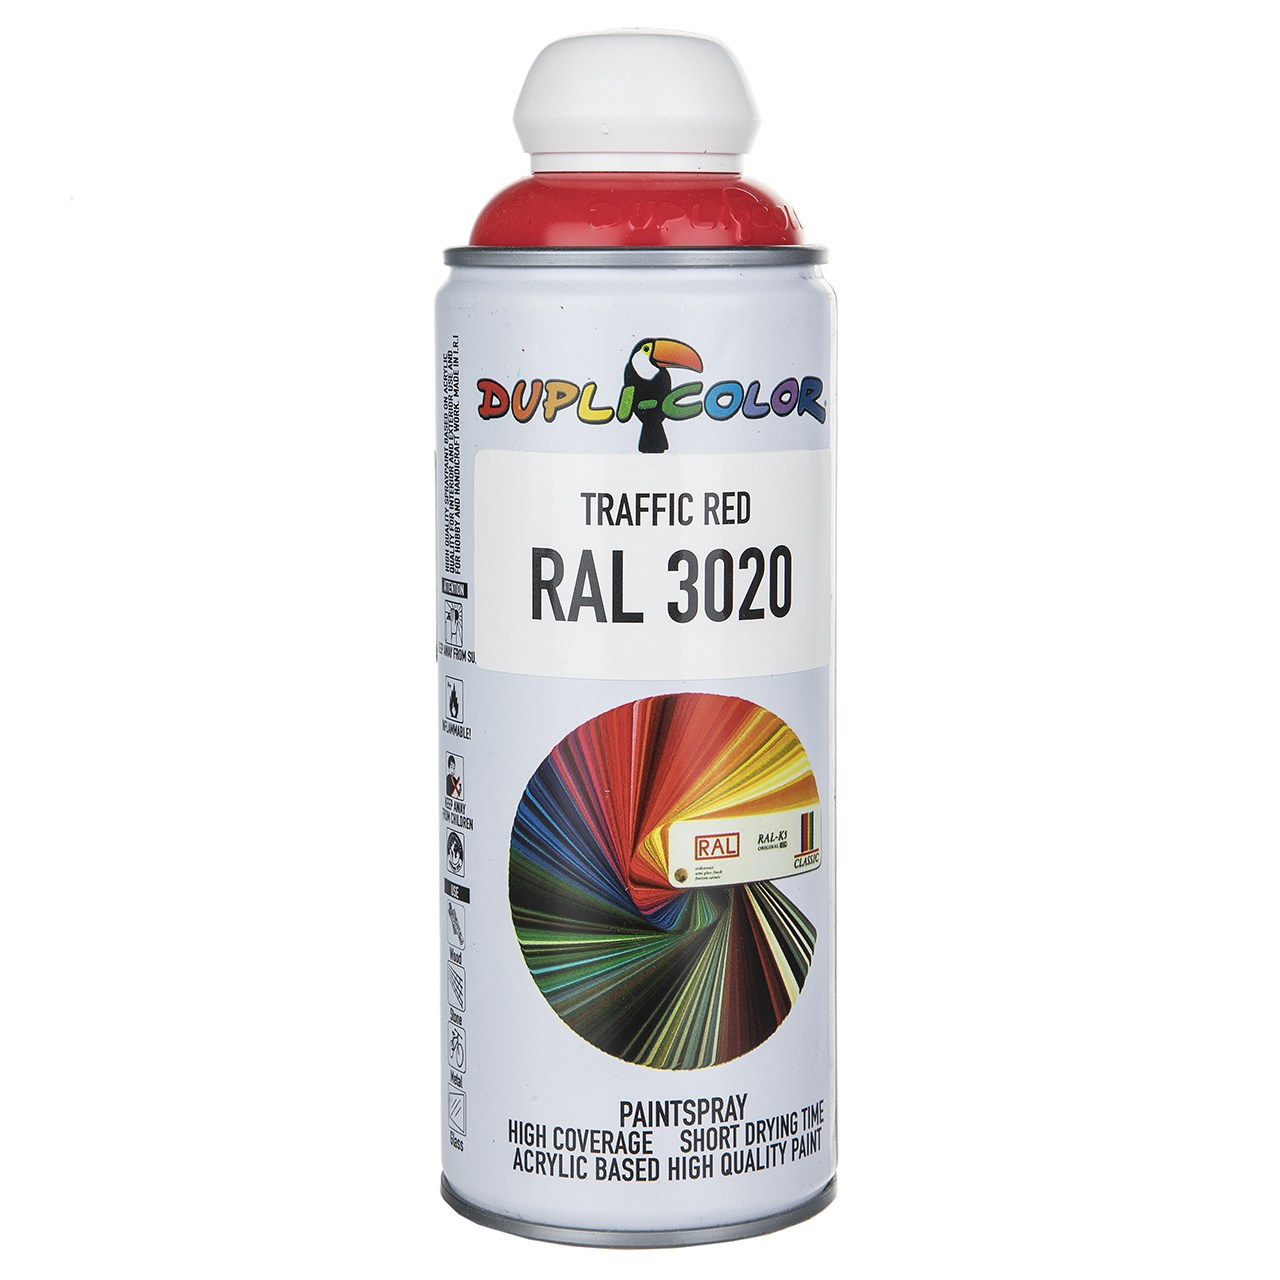 قیمت                                      اسپری رنگ قرمز دوپلی کالر مدل RAL 3020 حجم 400 میلی لیتر